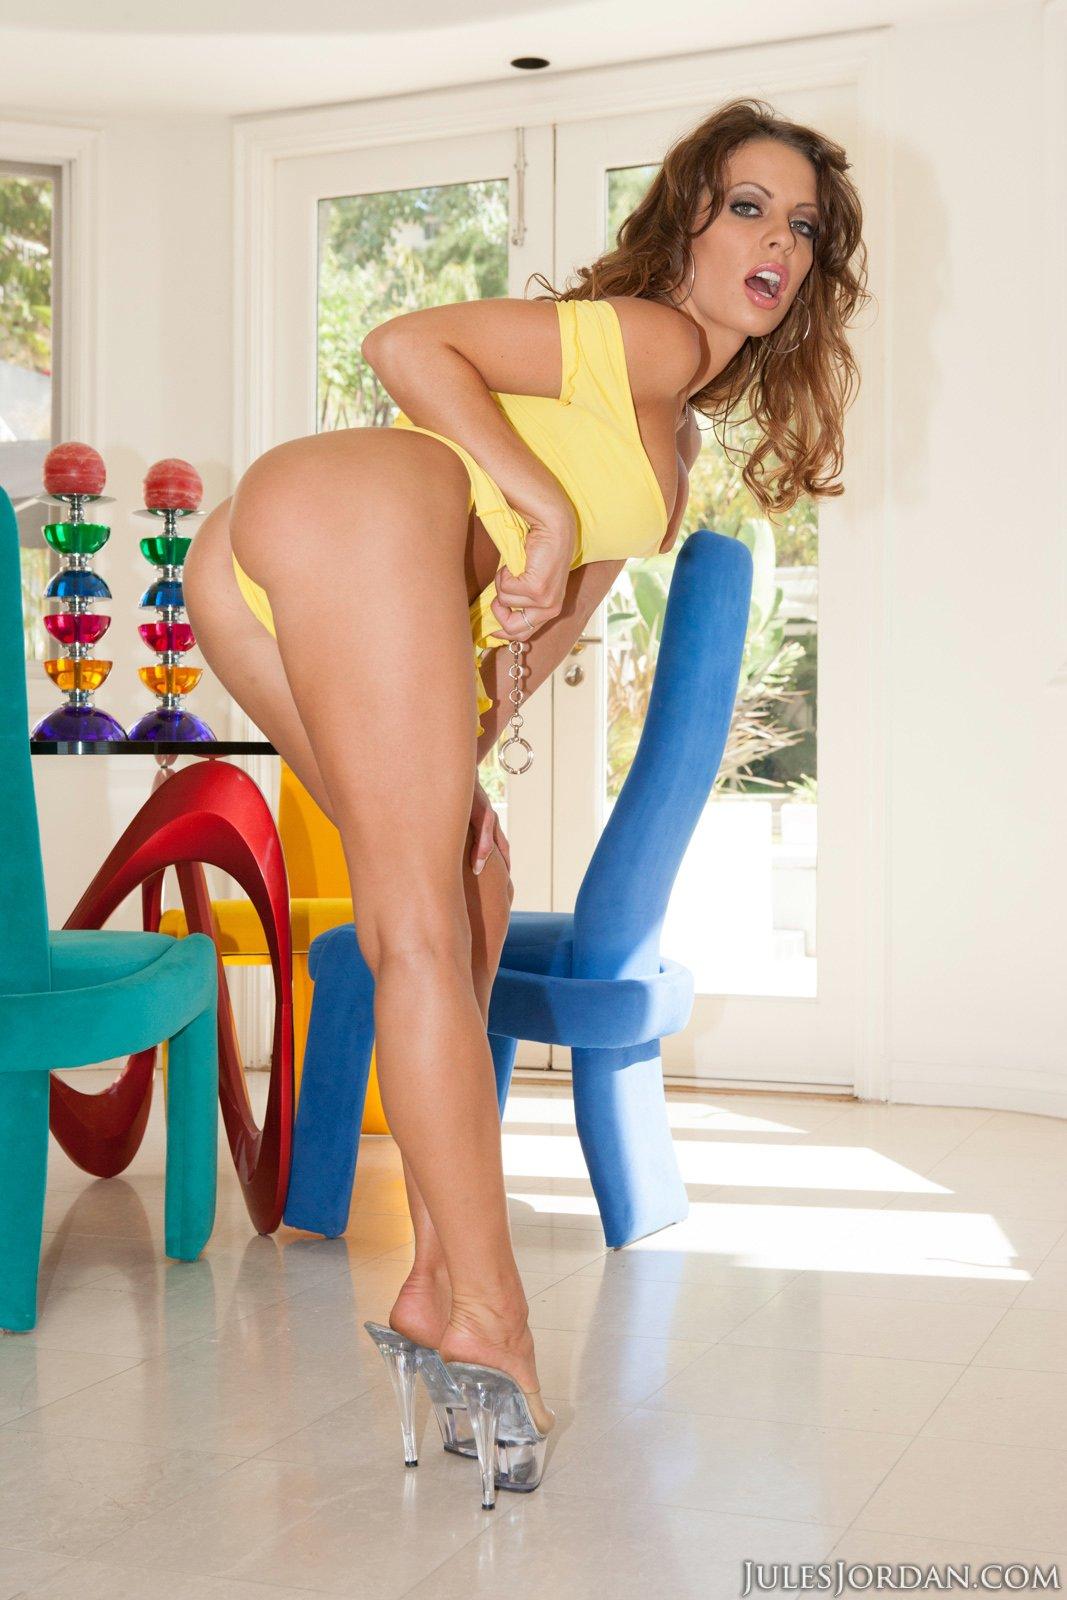 Masha 6 Porniteca Beautifullteens Hot Naked Babes | CLOUDY ...